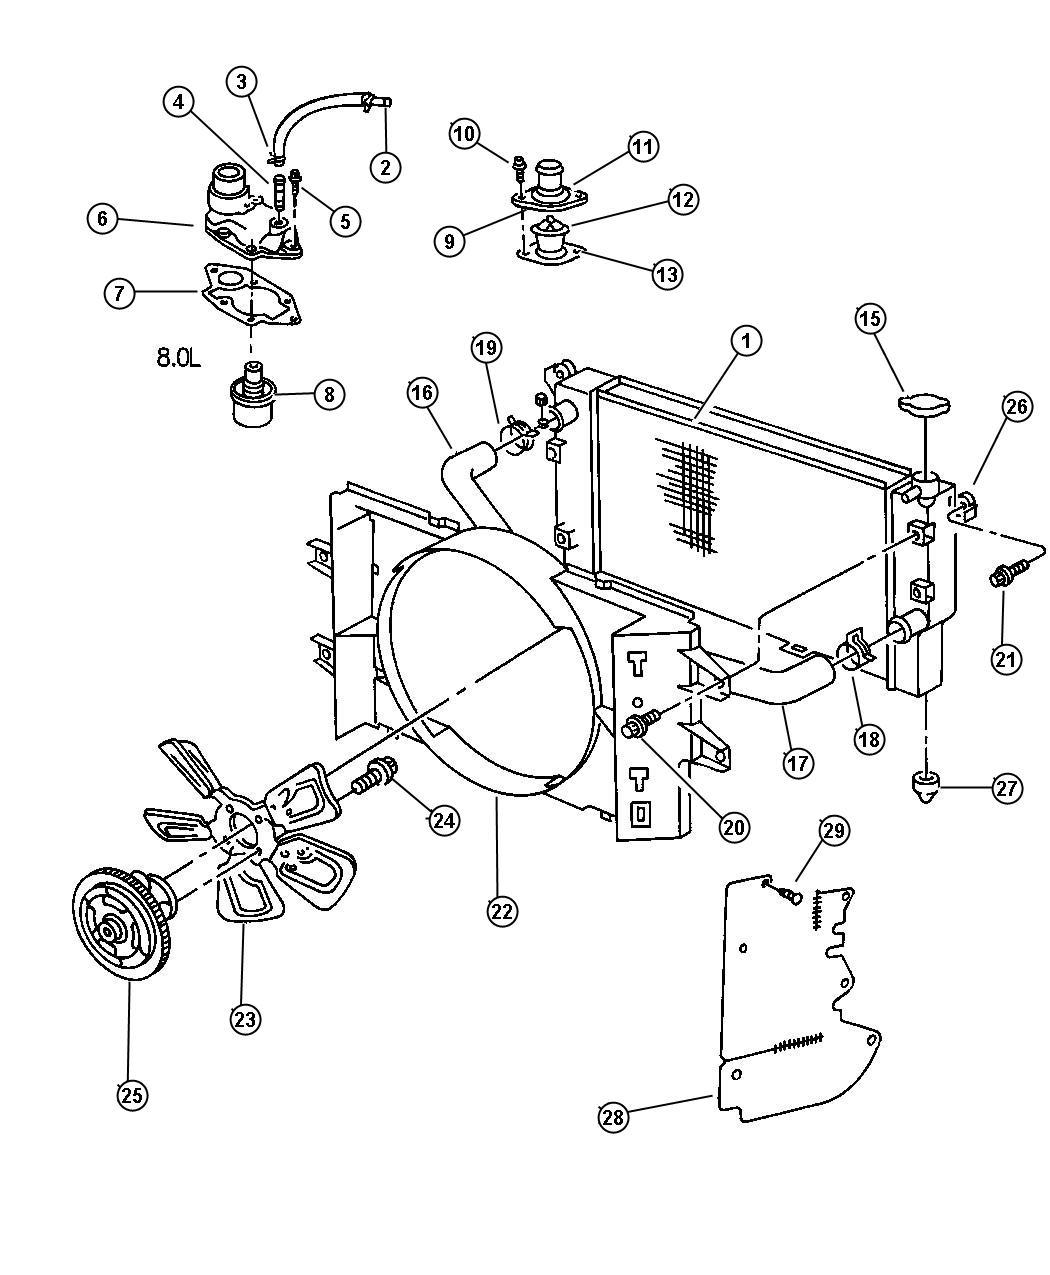 1998 Dodge Mins Wiring Diagram 1998 Dodge Durango Headlight ... on